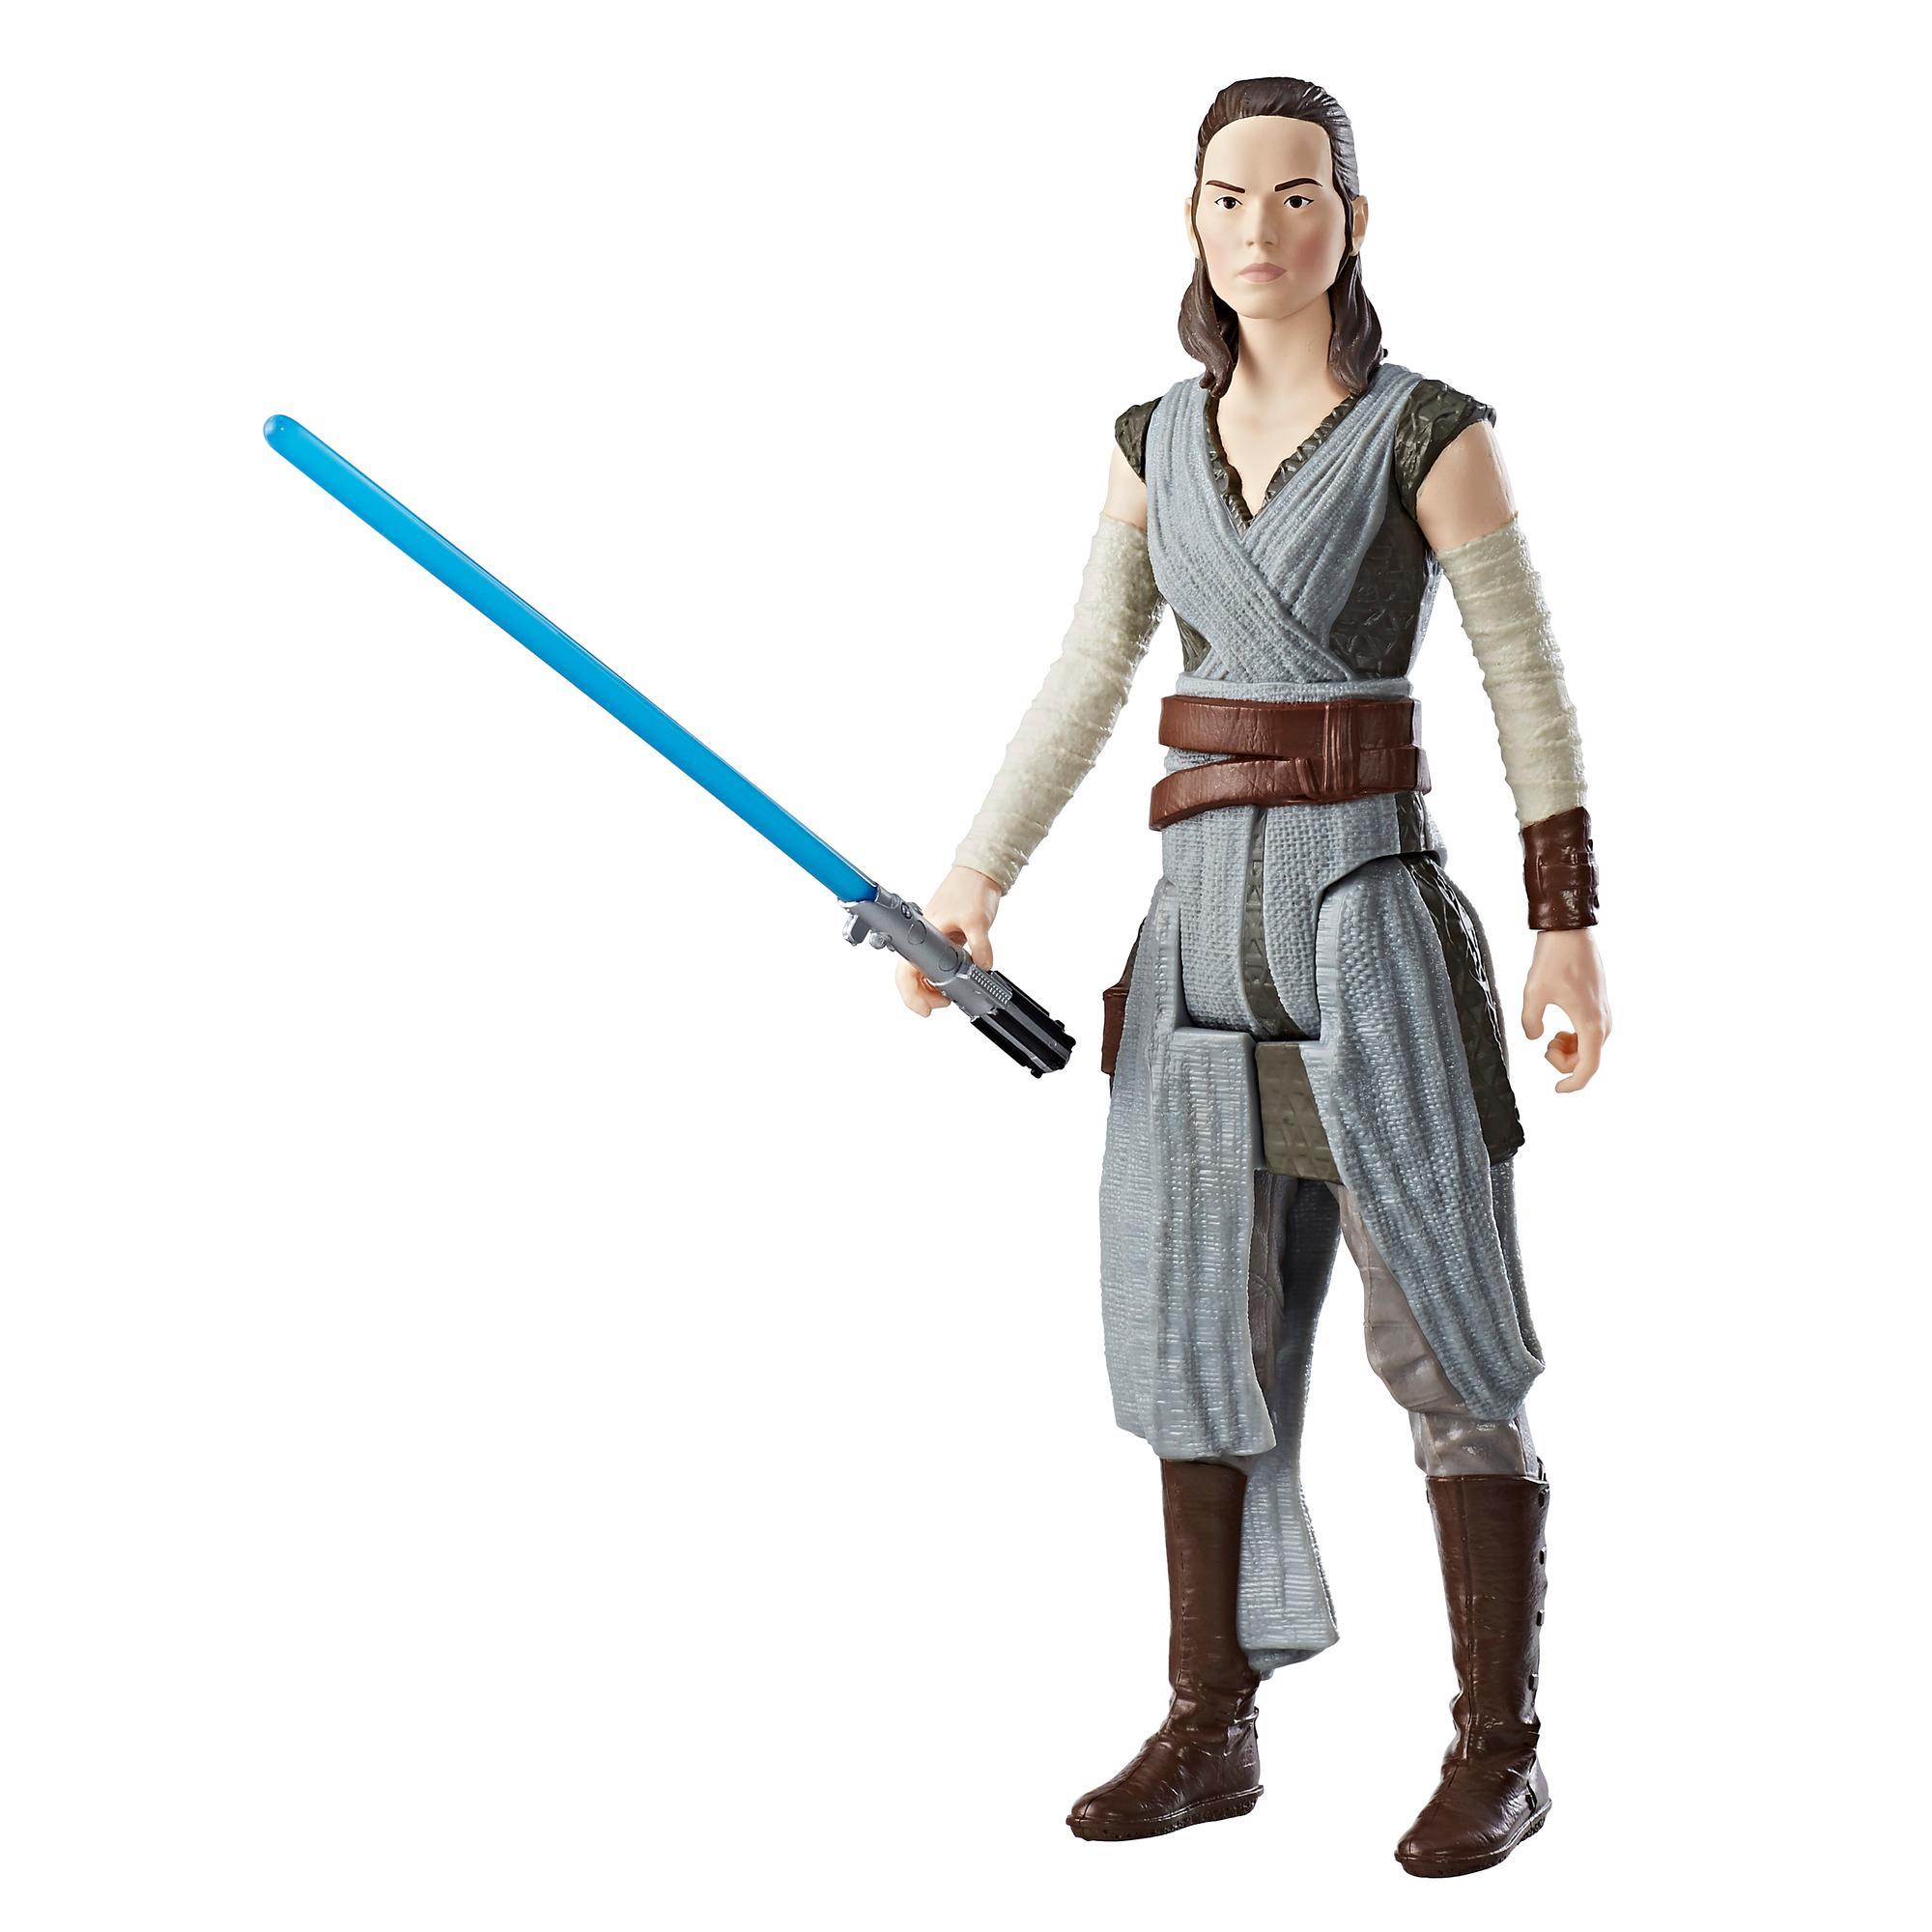 Star Wars: The Last Jedi 12-inch Rey (Jedi Training) Figure